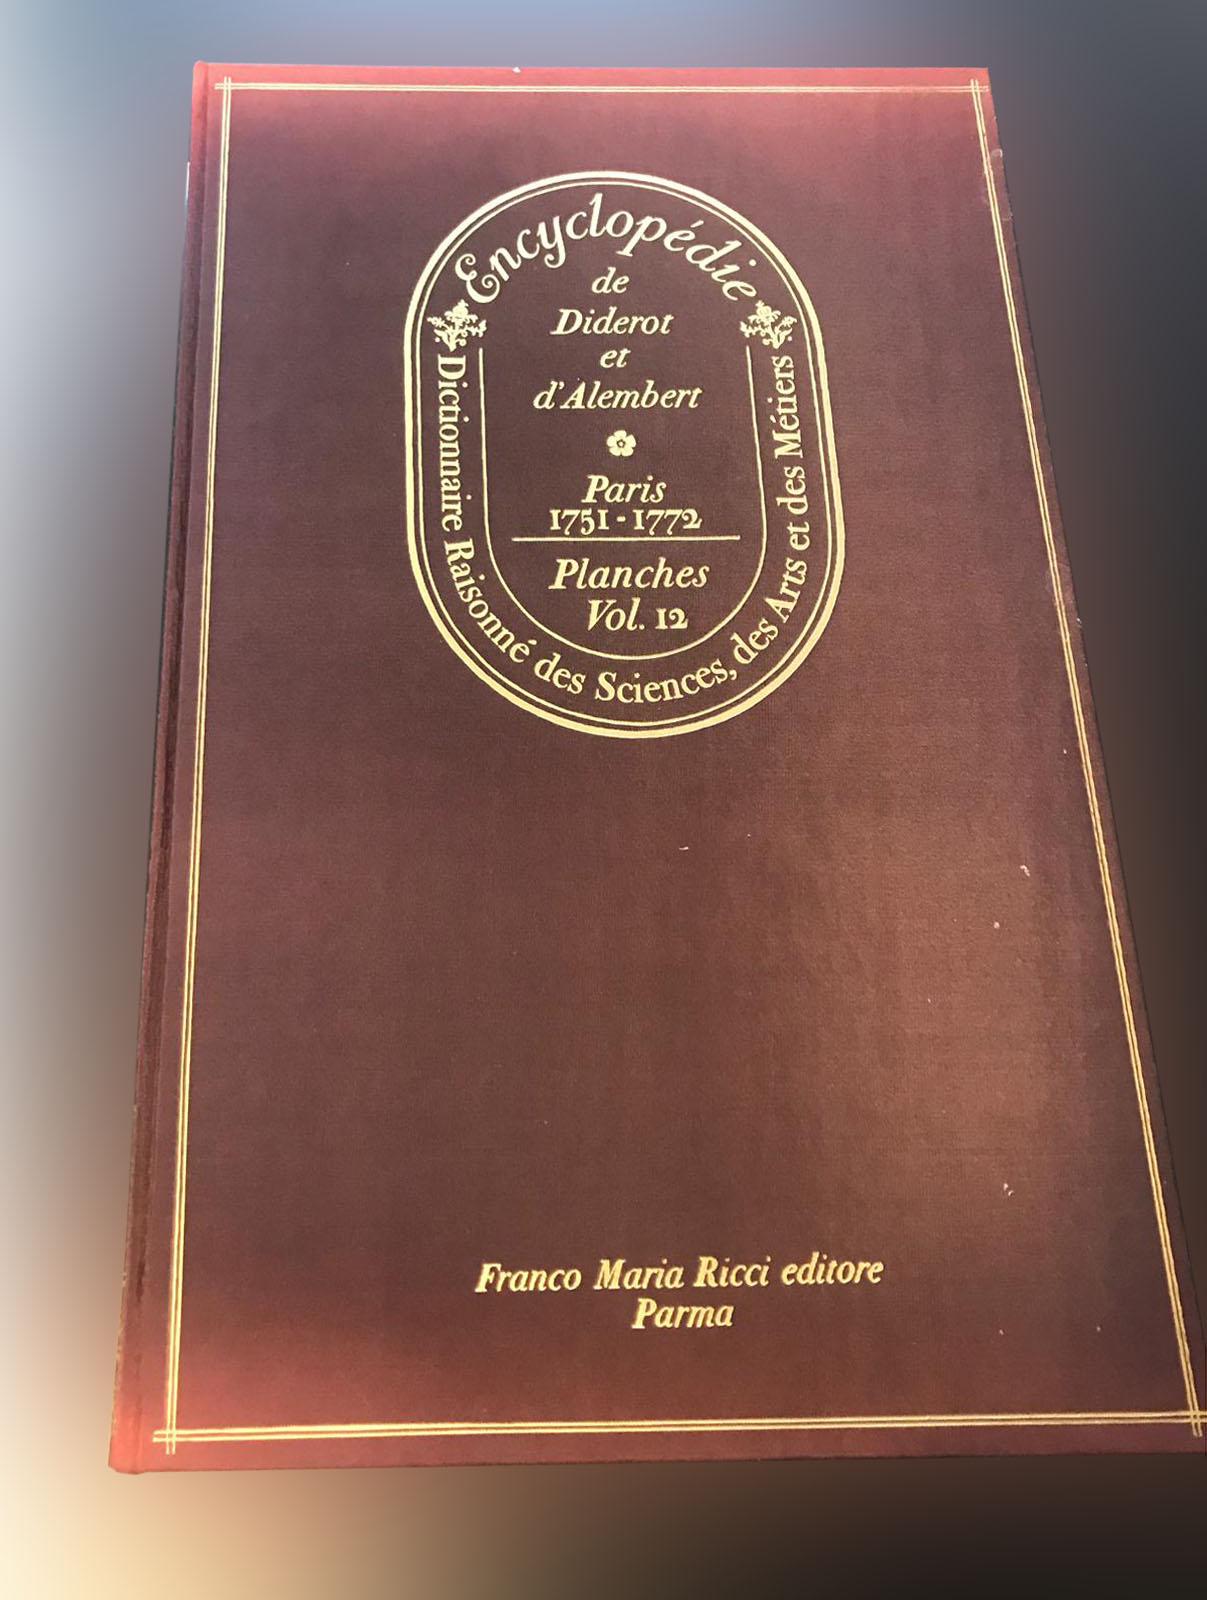 Encyclopédie de Diderot et d'Alambert – FMR